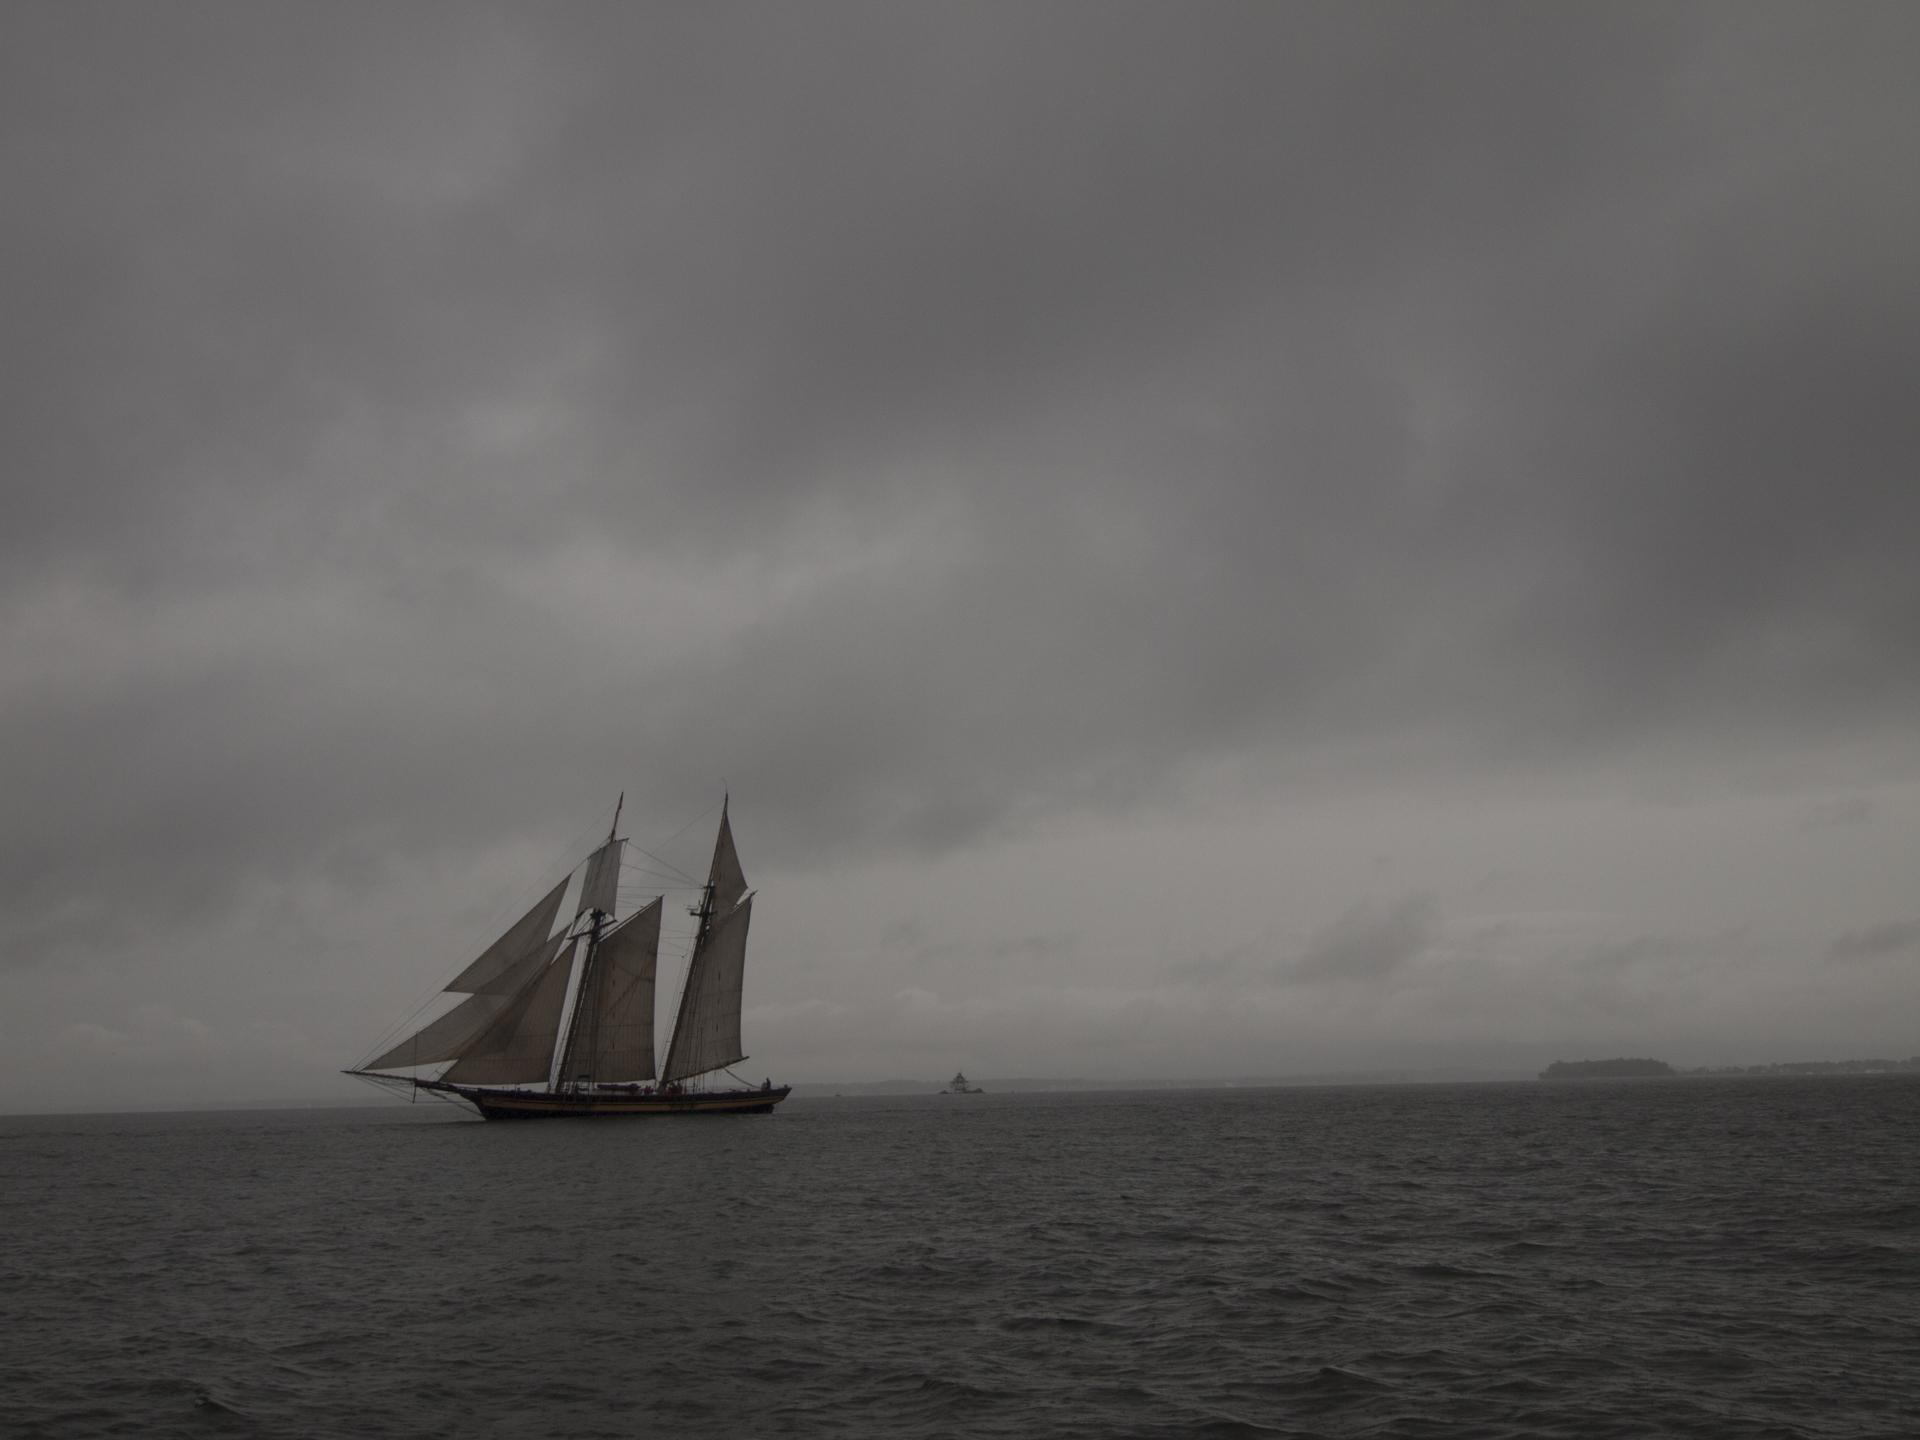 19_Water, Sails_04.jpg